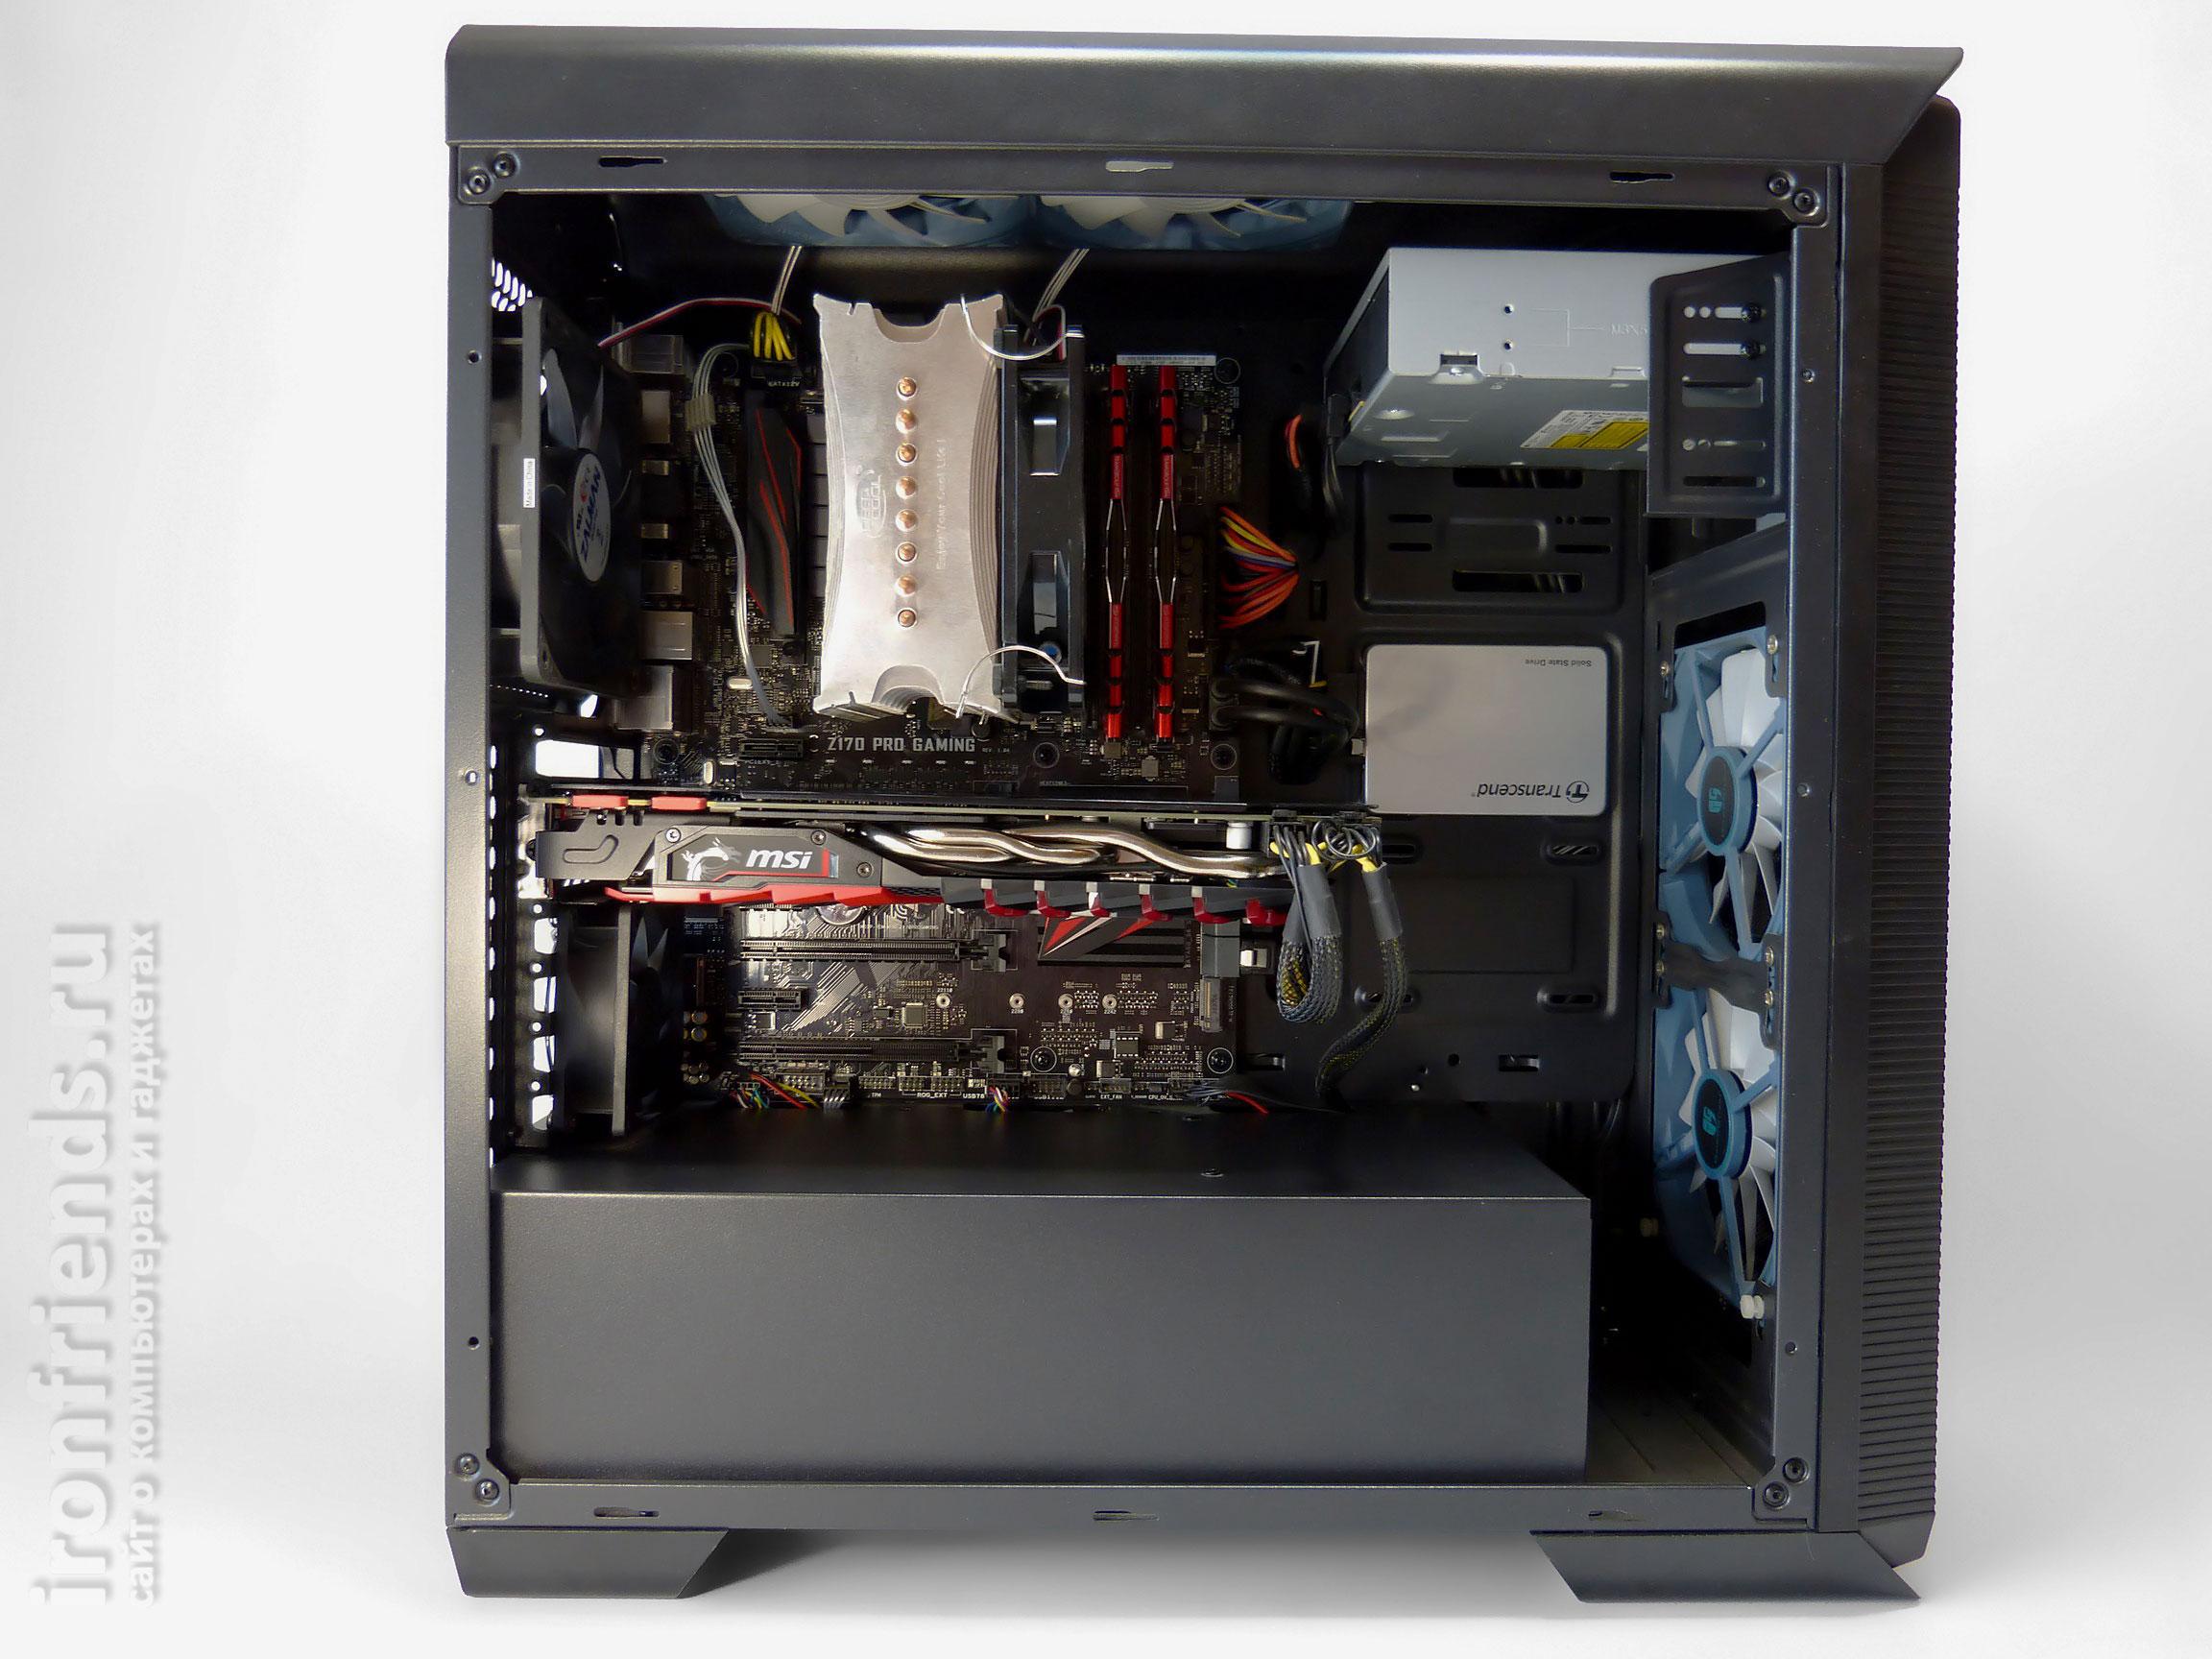 Установка MSI GTX 1080 Gaming X в корпус